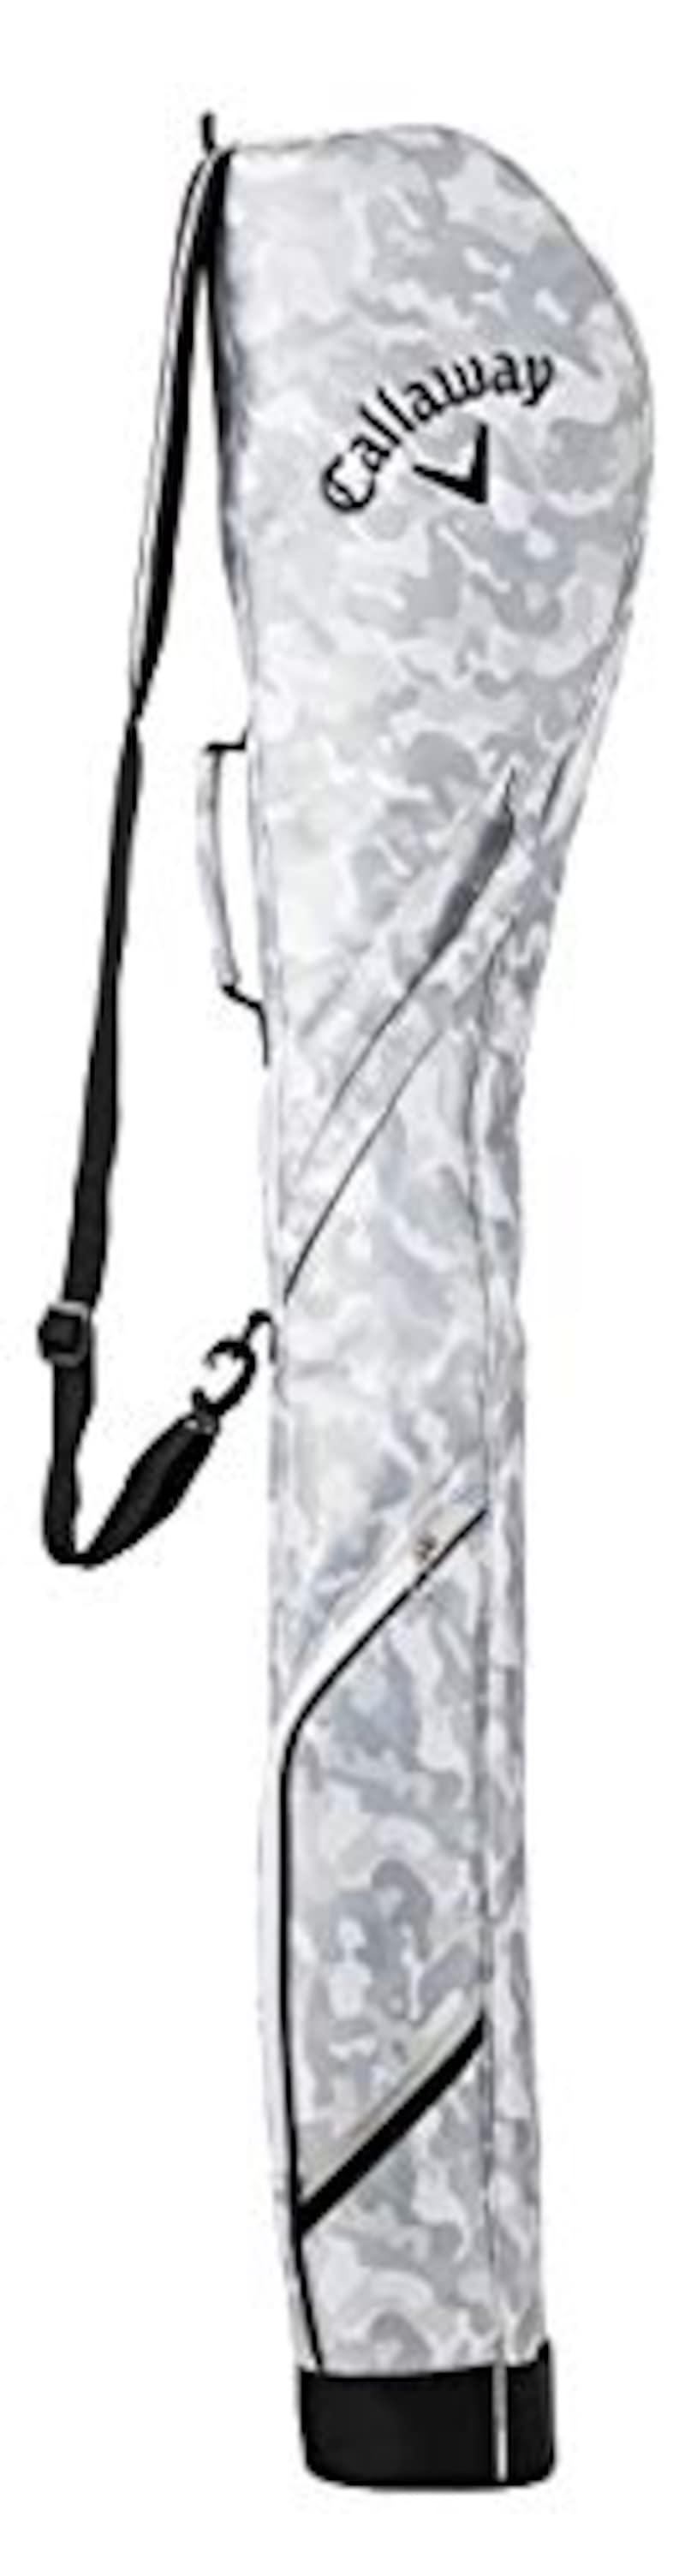 Callaway(キャロウェイ),クラブケース SPORT メンズ 2021年モデル